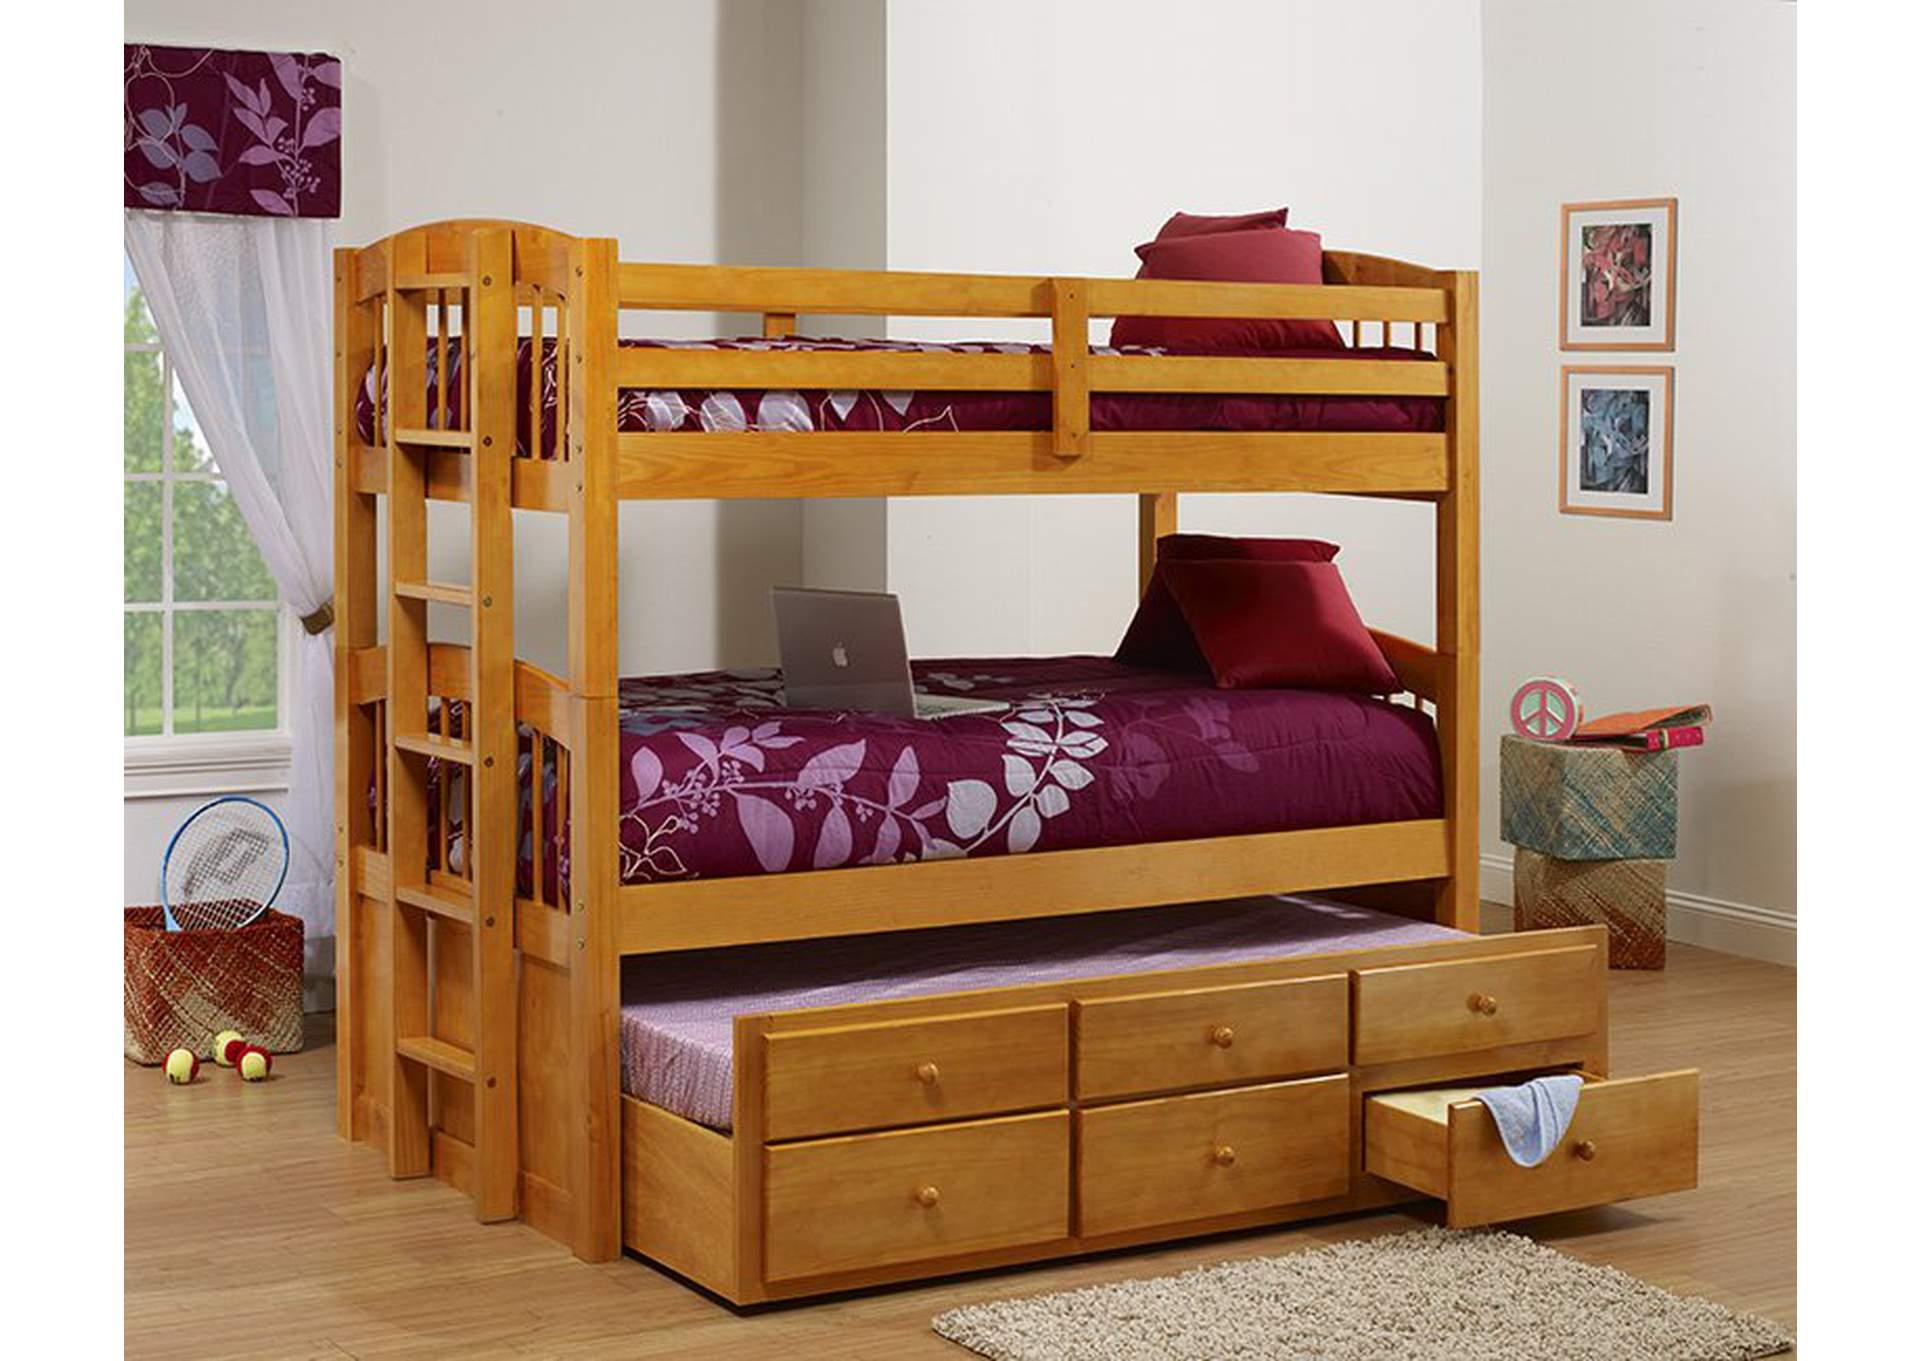 Honey Triple Twin Bunk Bed,Furniture World Distributors